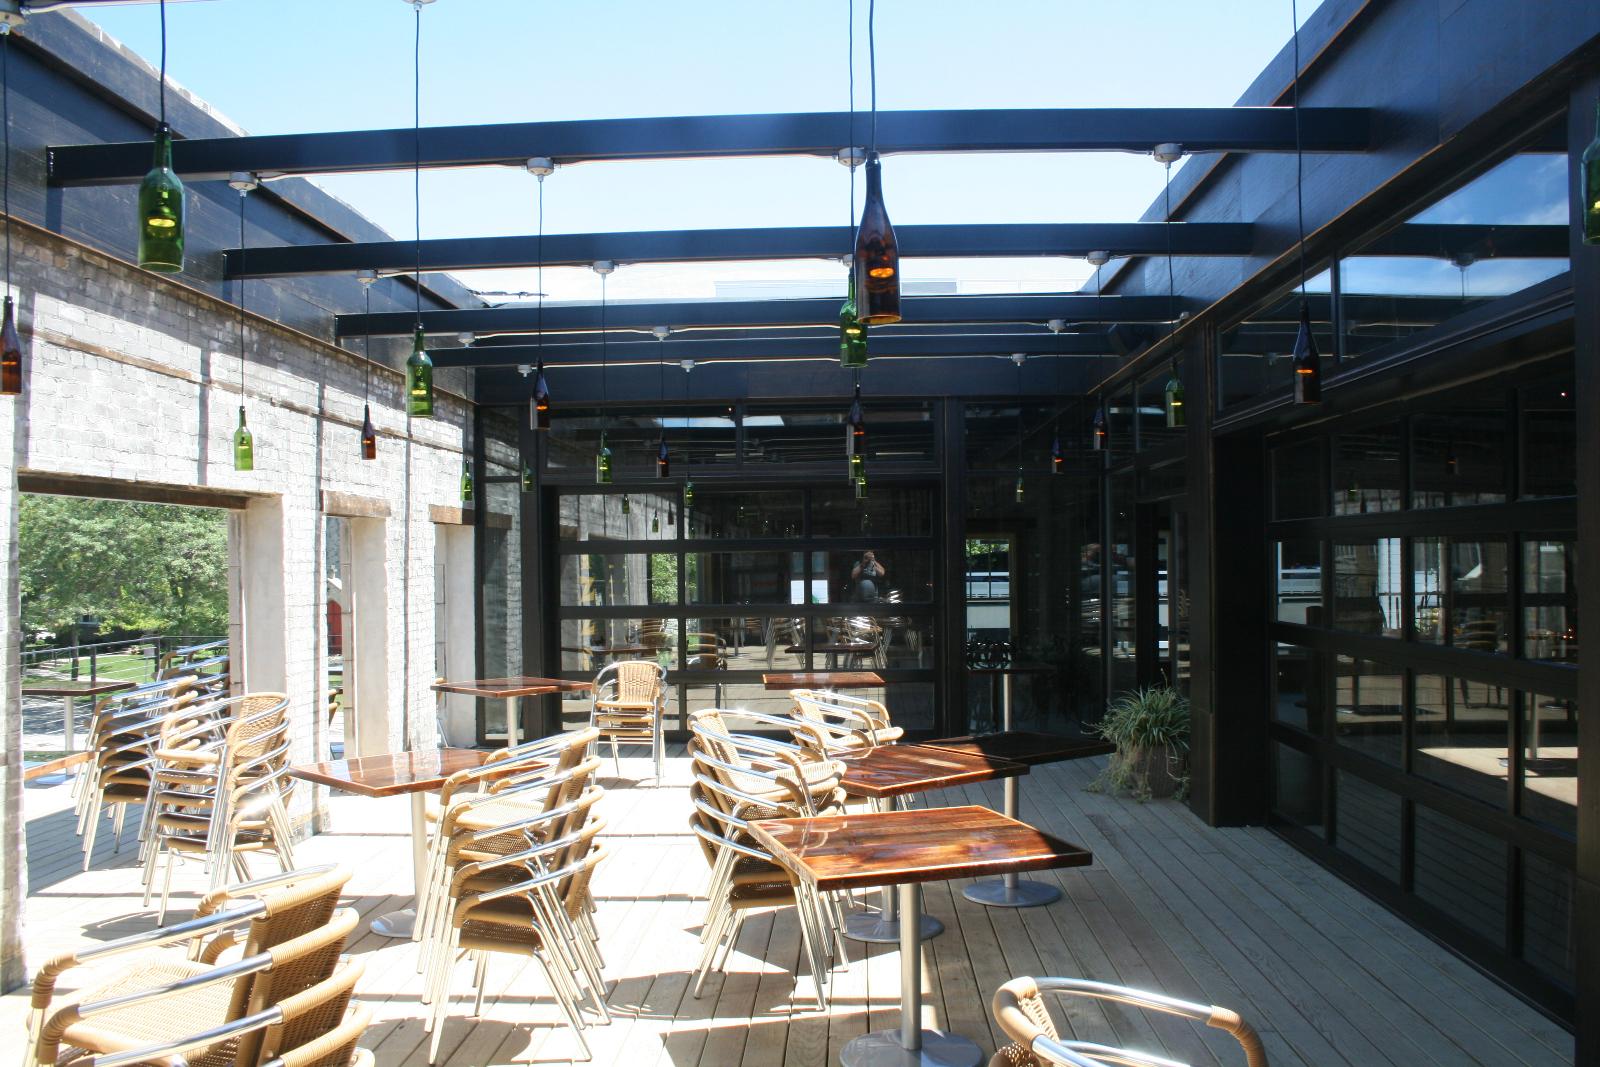 Second floor outdoor courtyard at Pizza Man.